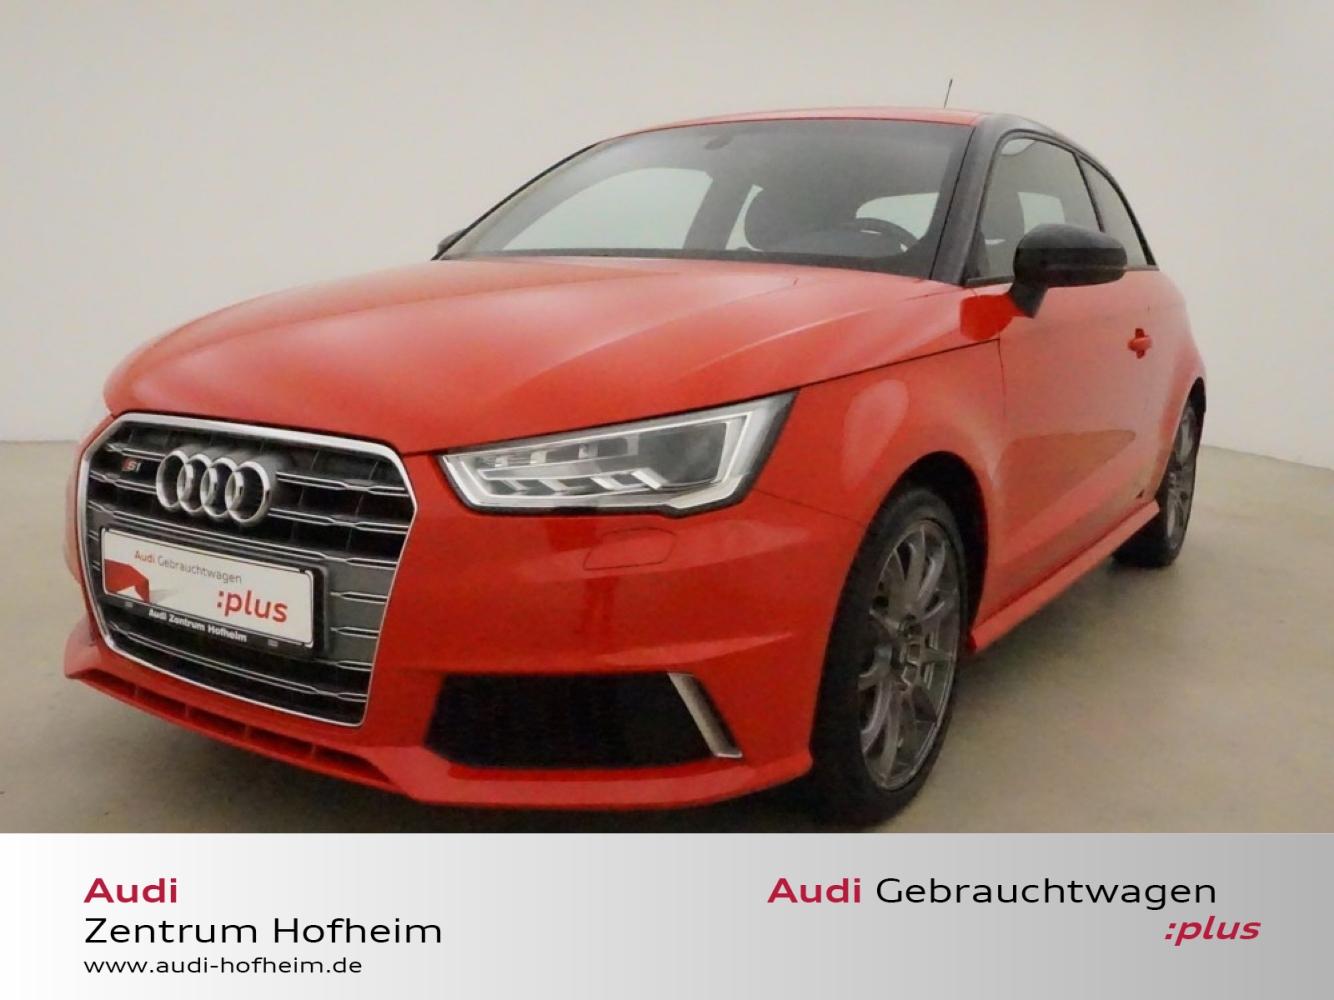 Audi S1 2.0 TFSI qu. 170kW*Xenon+*PDC*Radio*Klima*SHZ, Jahr 2014, Benzin